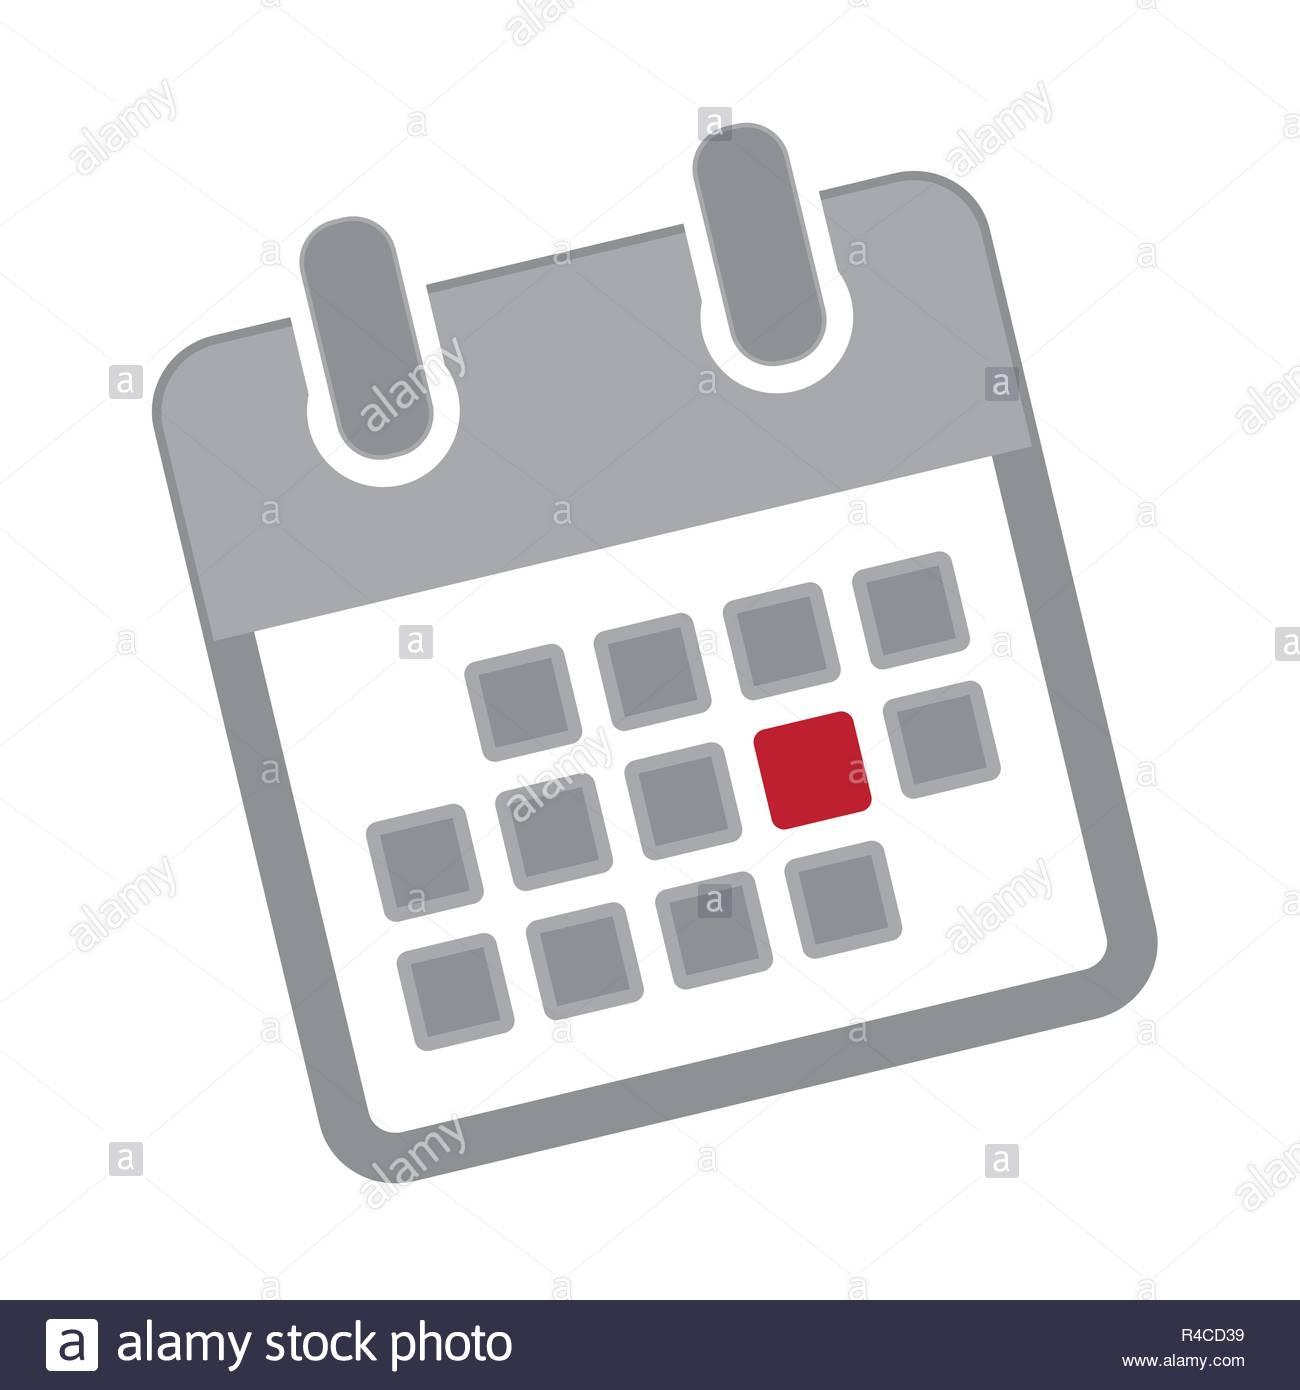 Appointment In A Grey Calendar Icon Pictogram Vector for Calendar Icon Grey